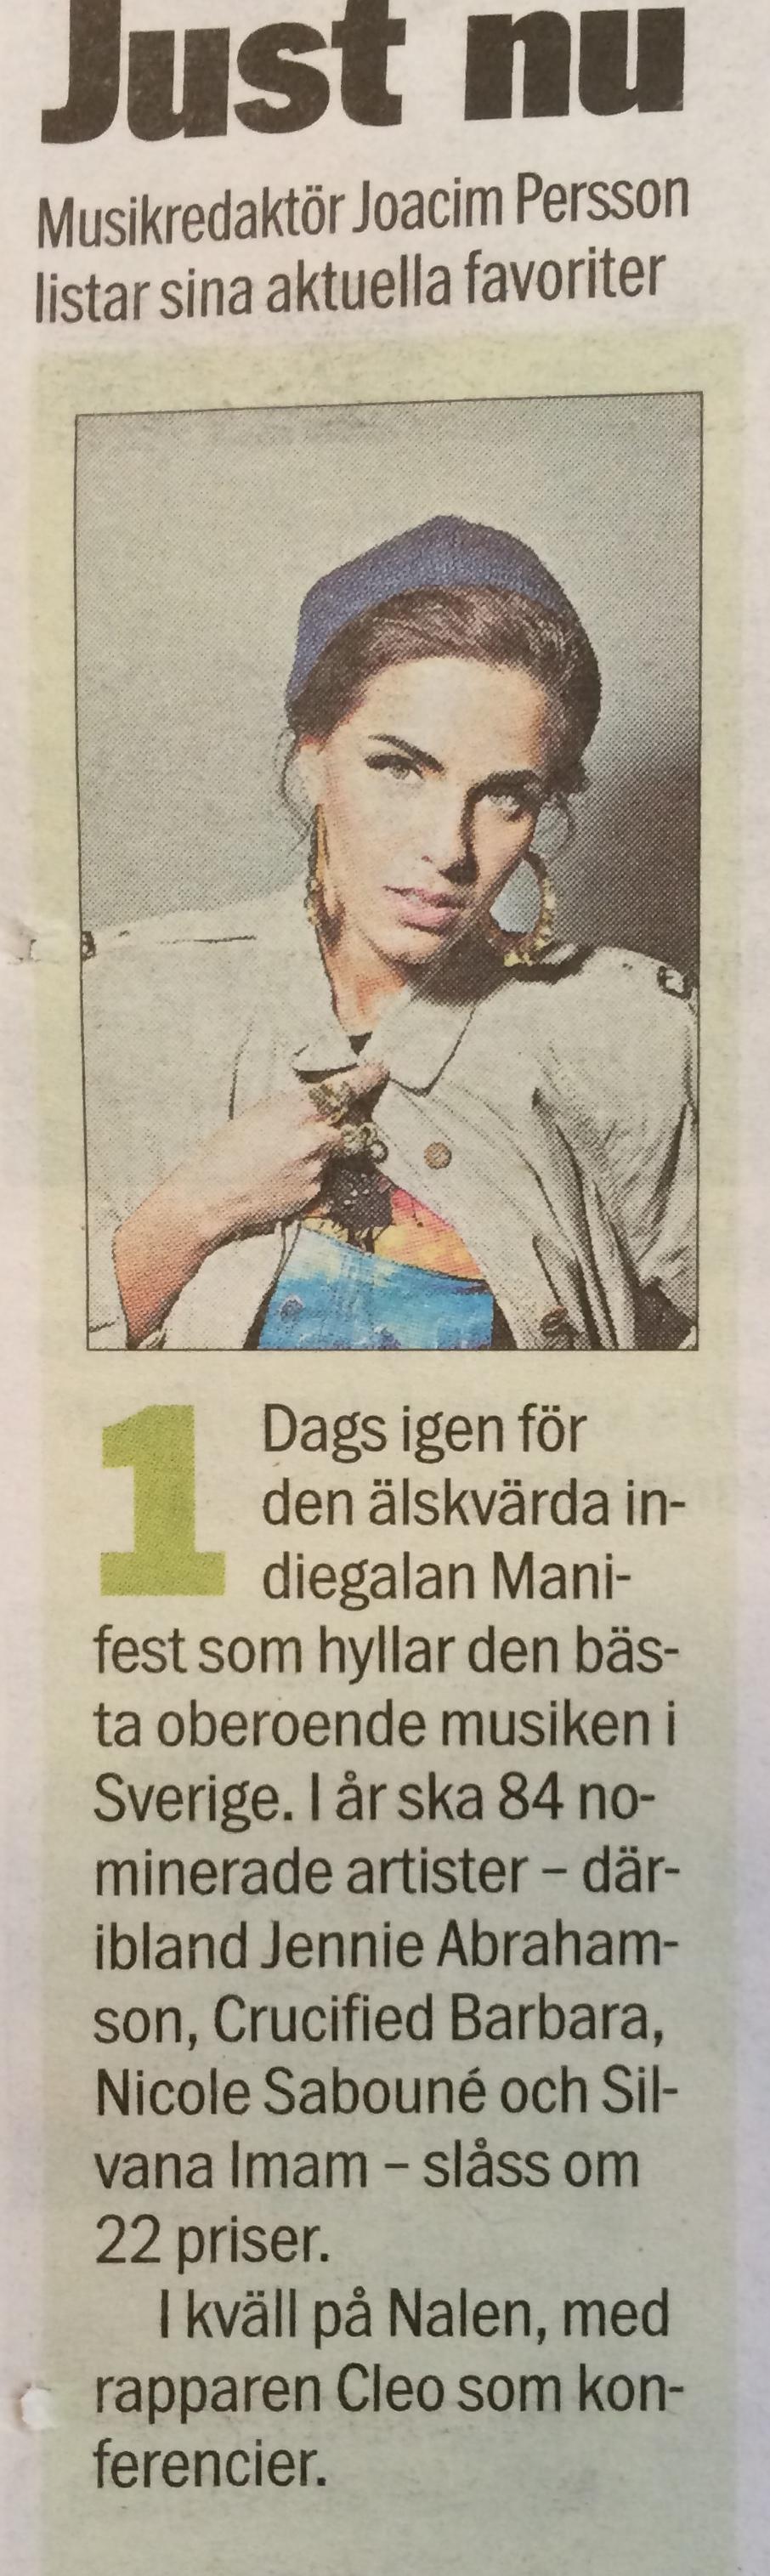 Manifestgalan 2015 - Jocke Persson tipsar.jpg